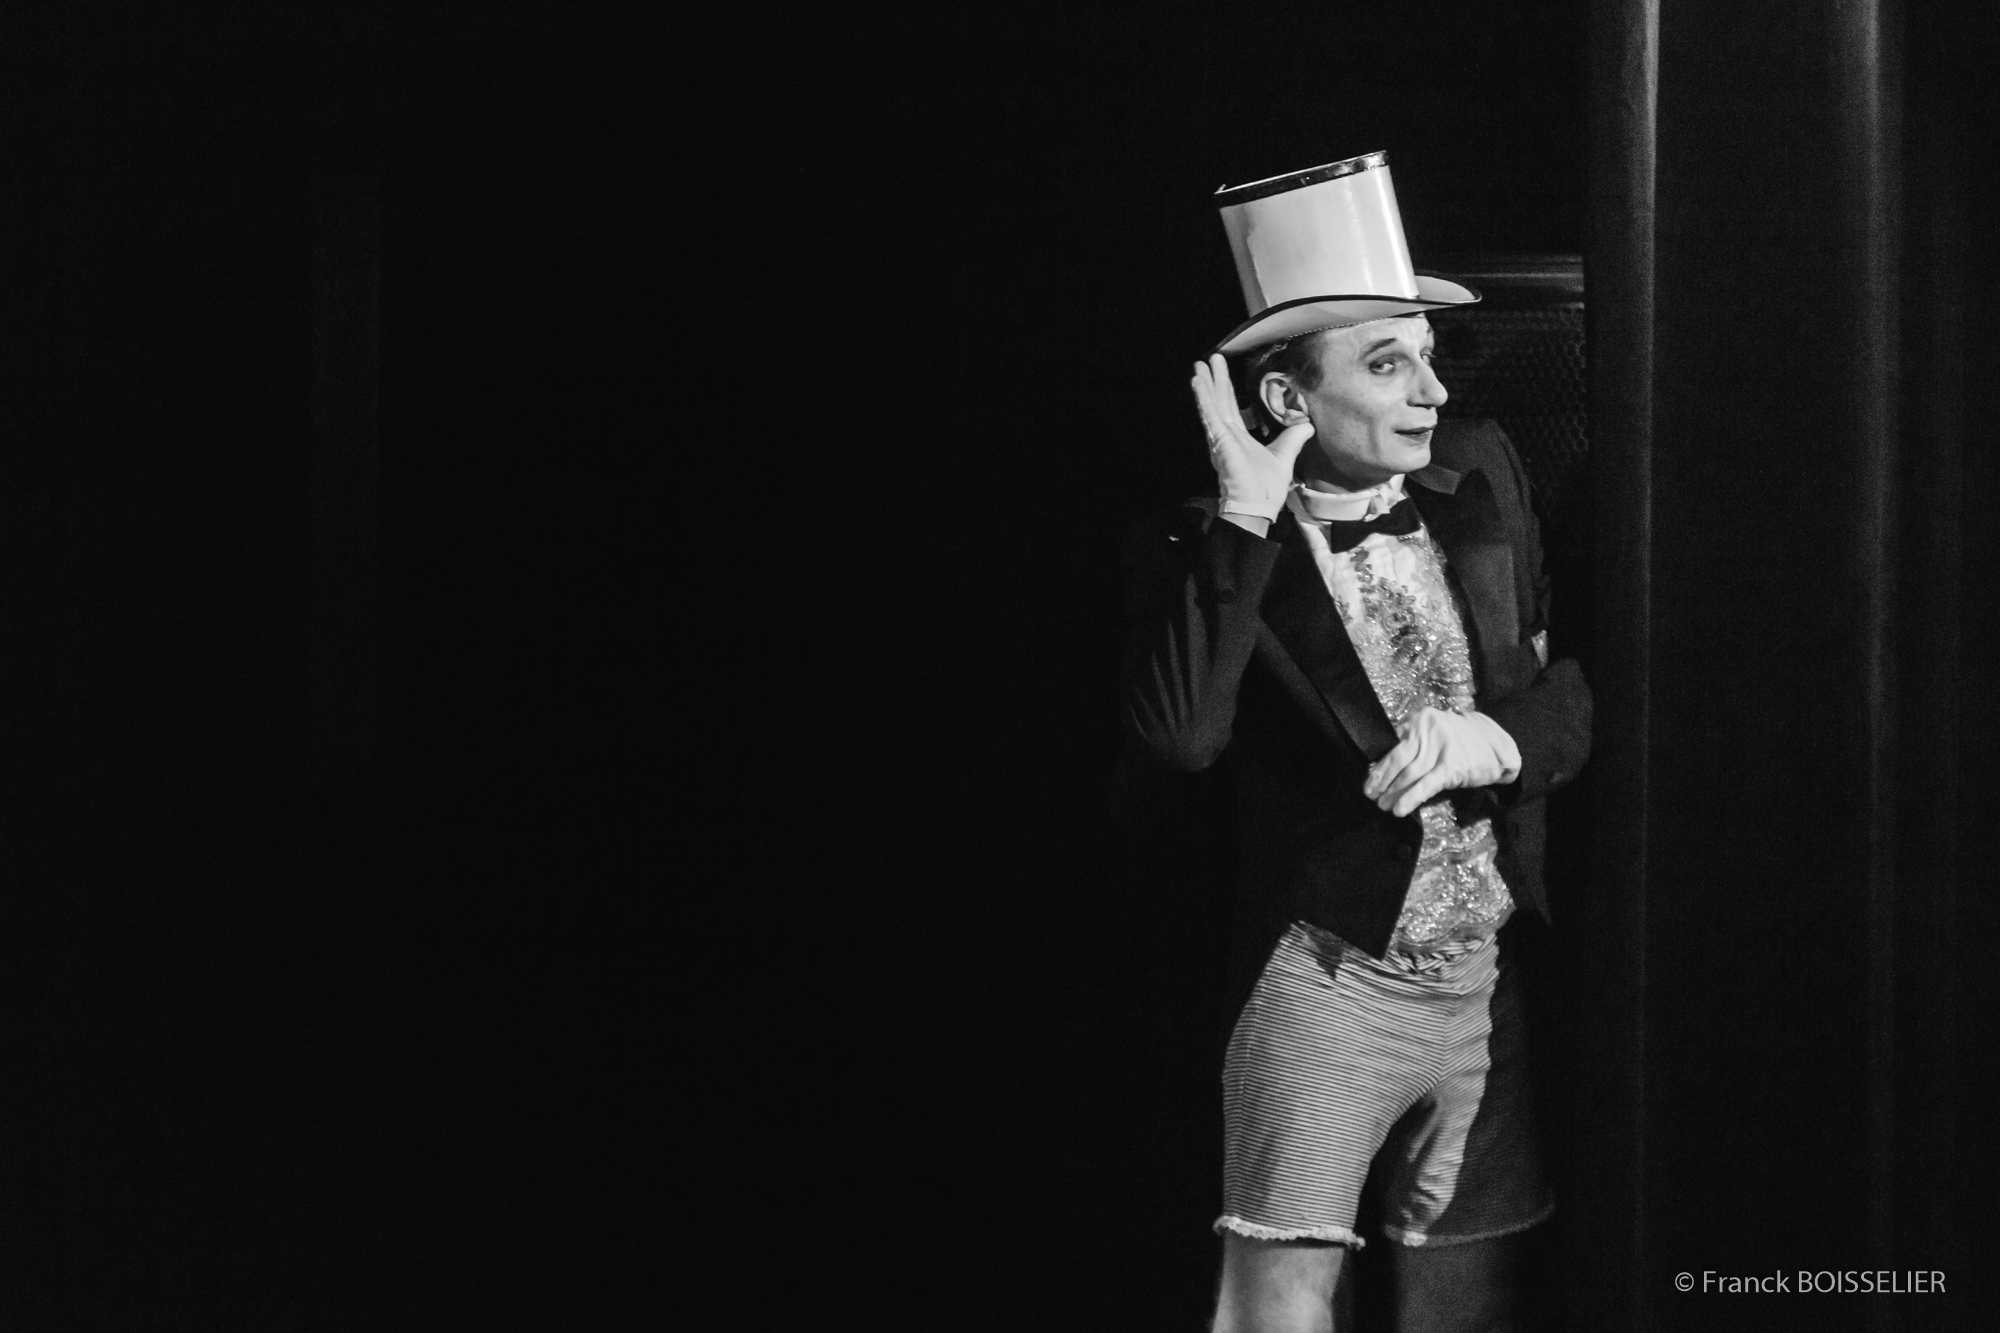 Festival International de magie - Franck Boisselier Photographe Spectacle - Voronin